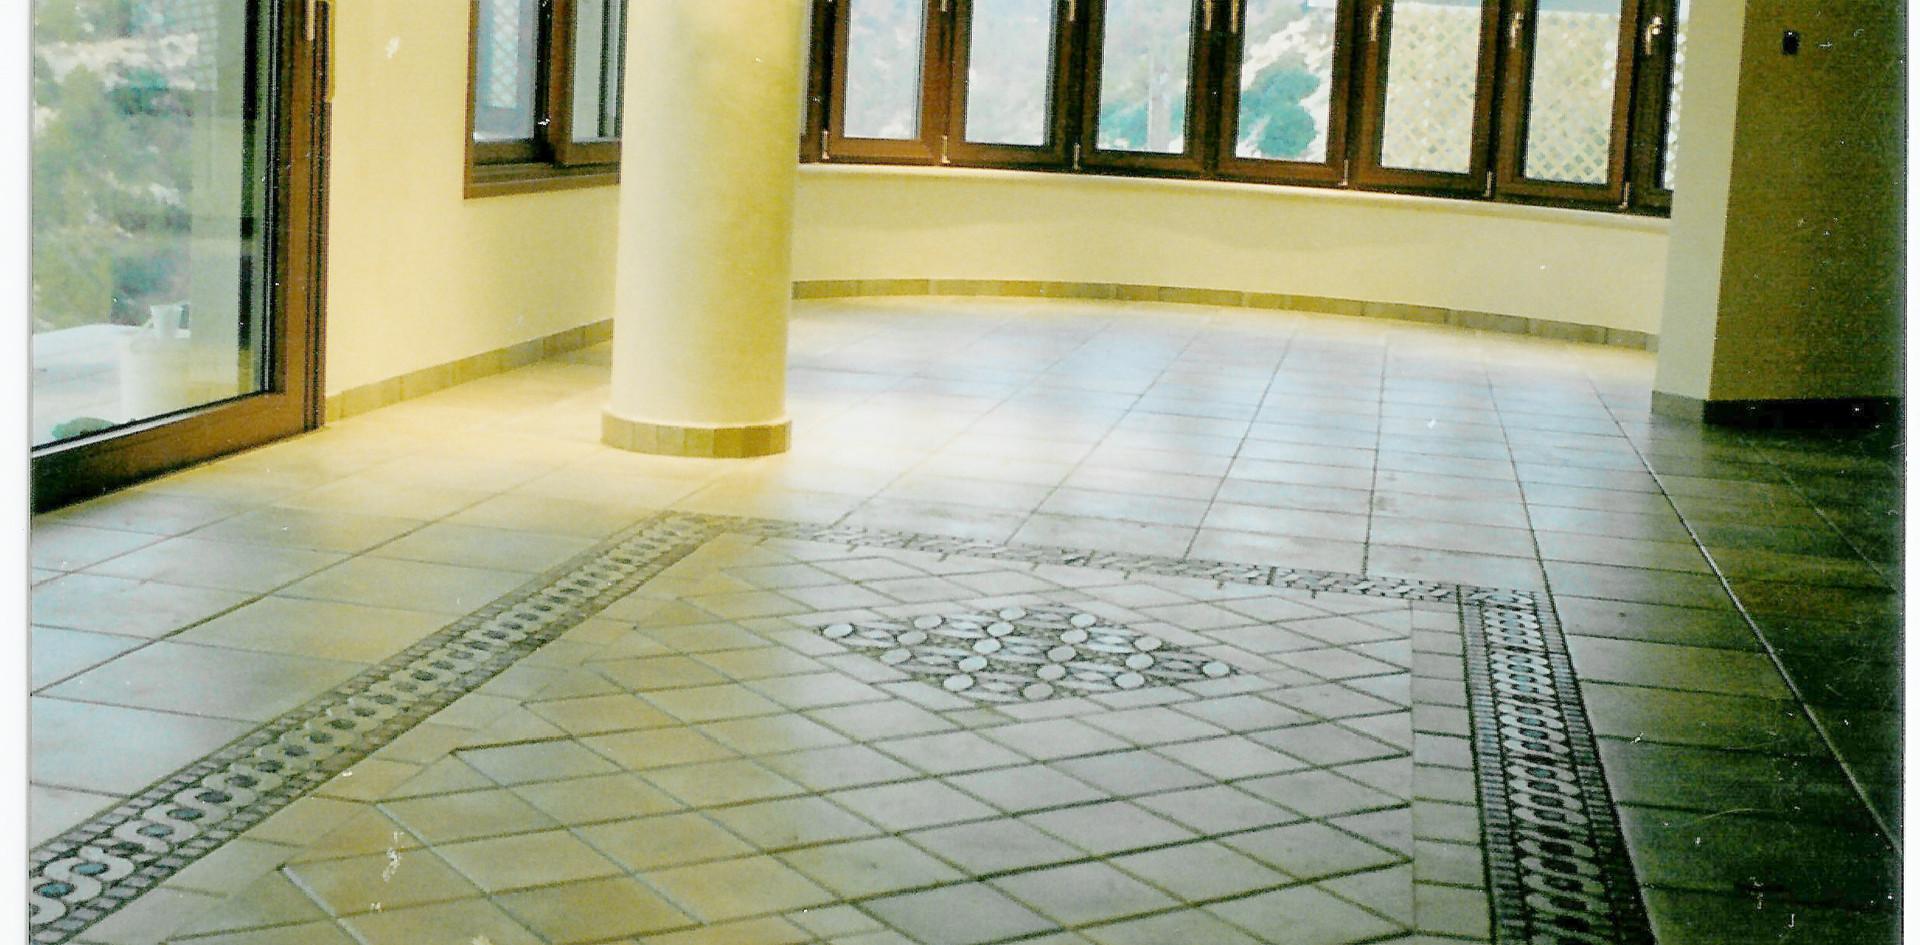 Tile Carpet Pool Level Goldberg House De